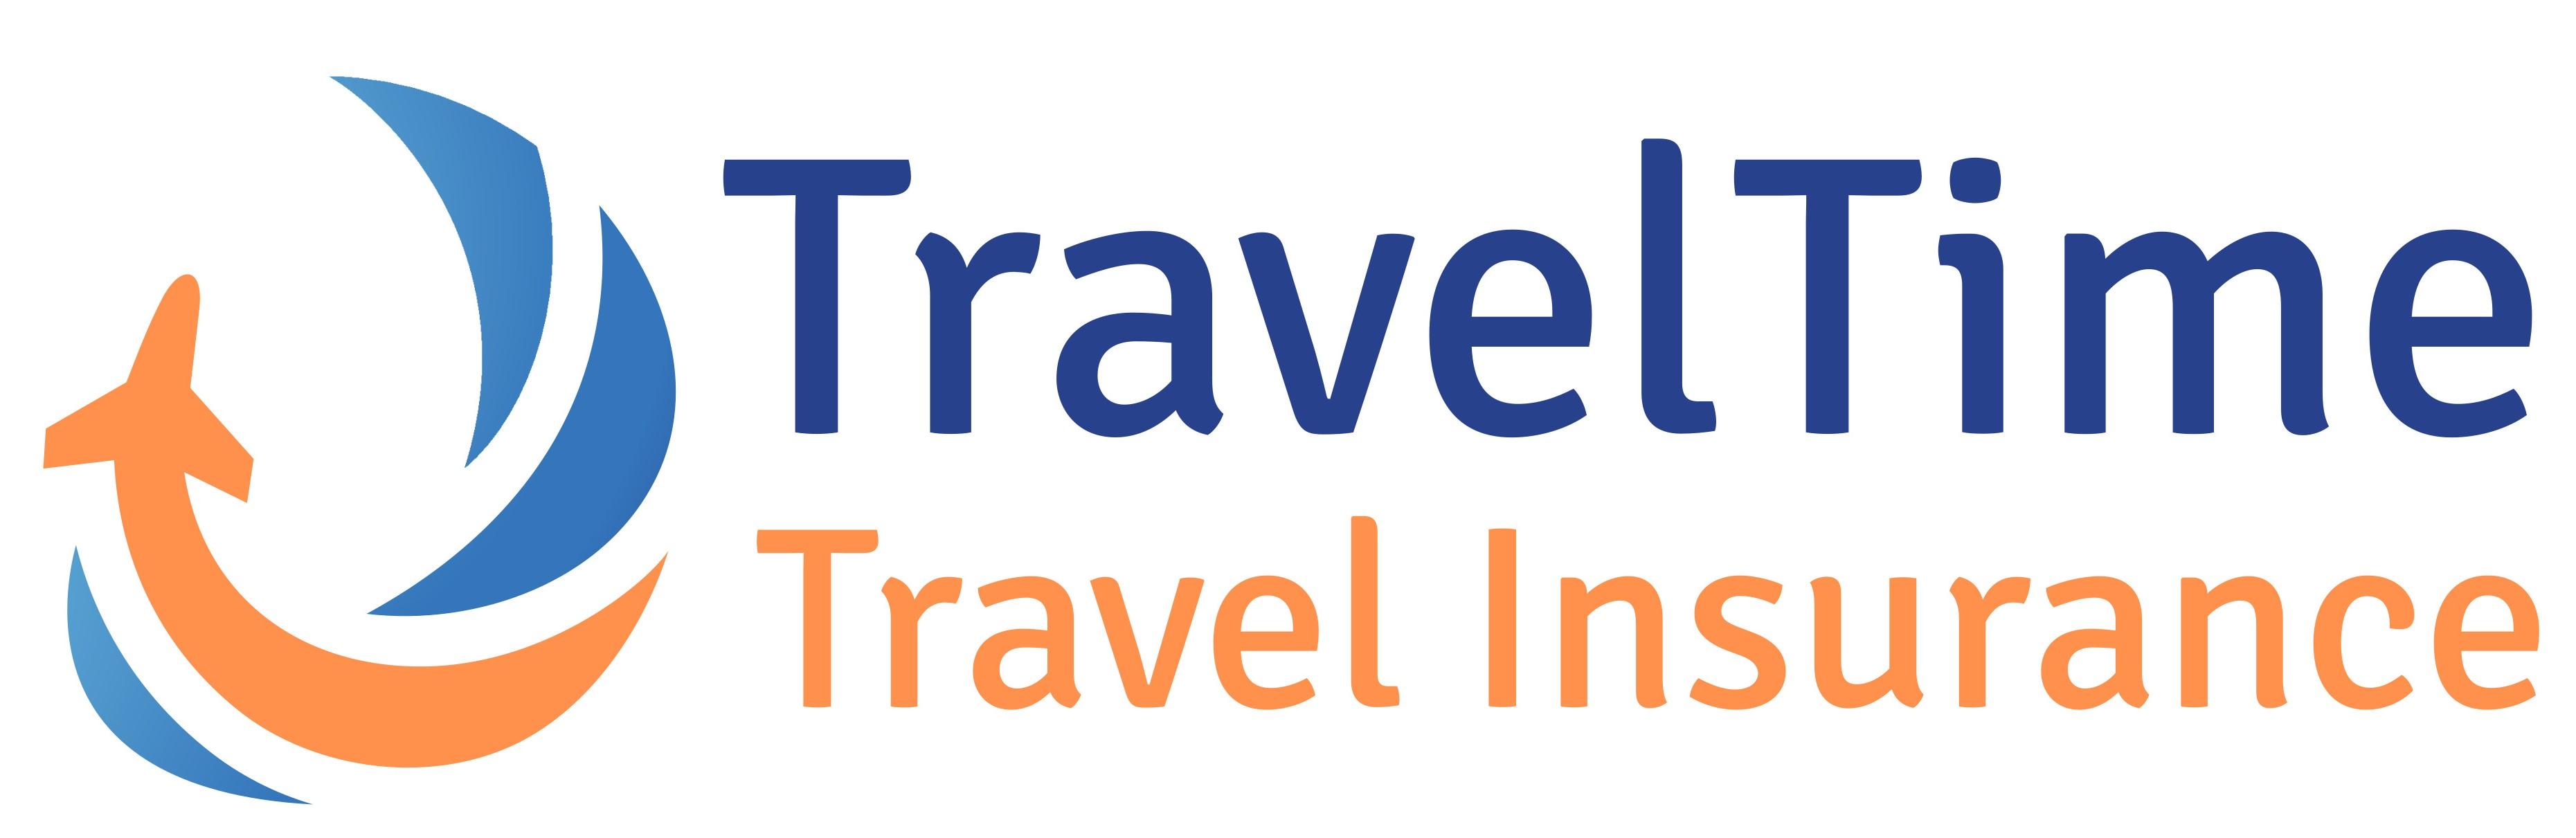 Read TravelTime Travel Insurance Reviews